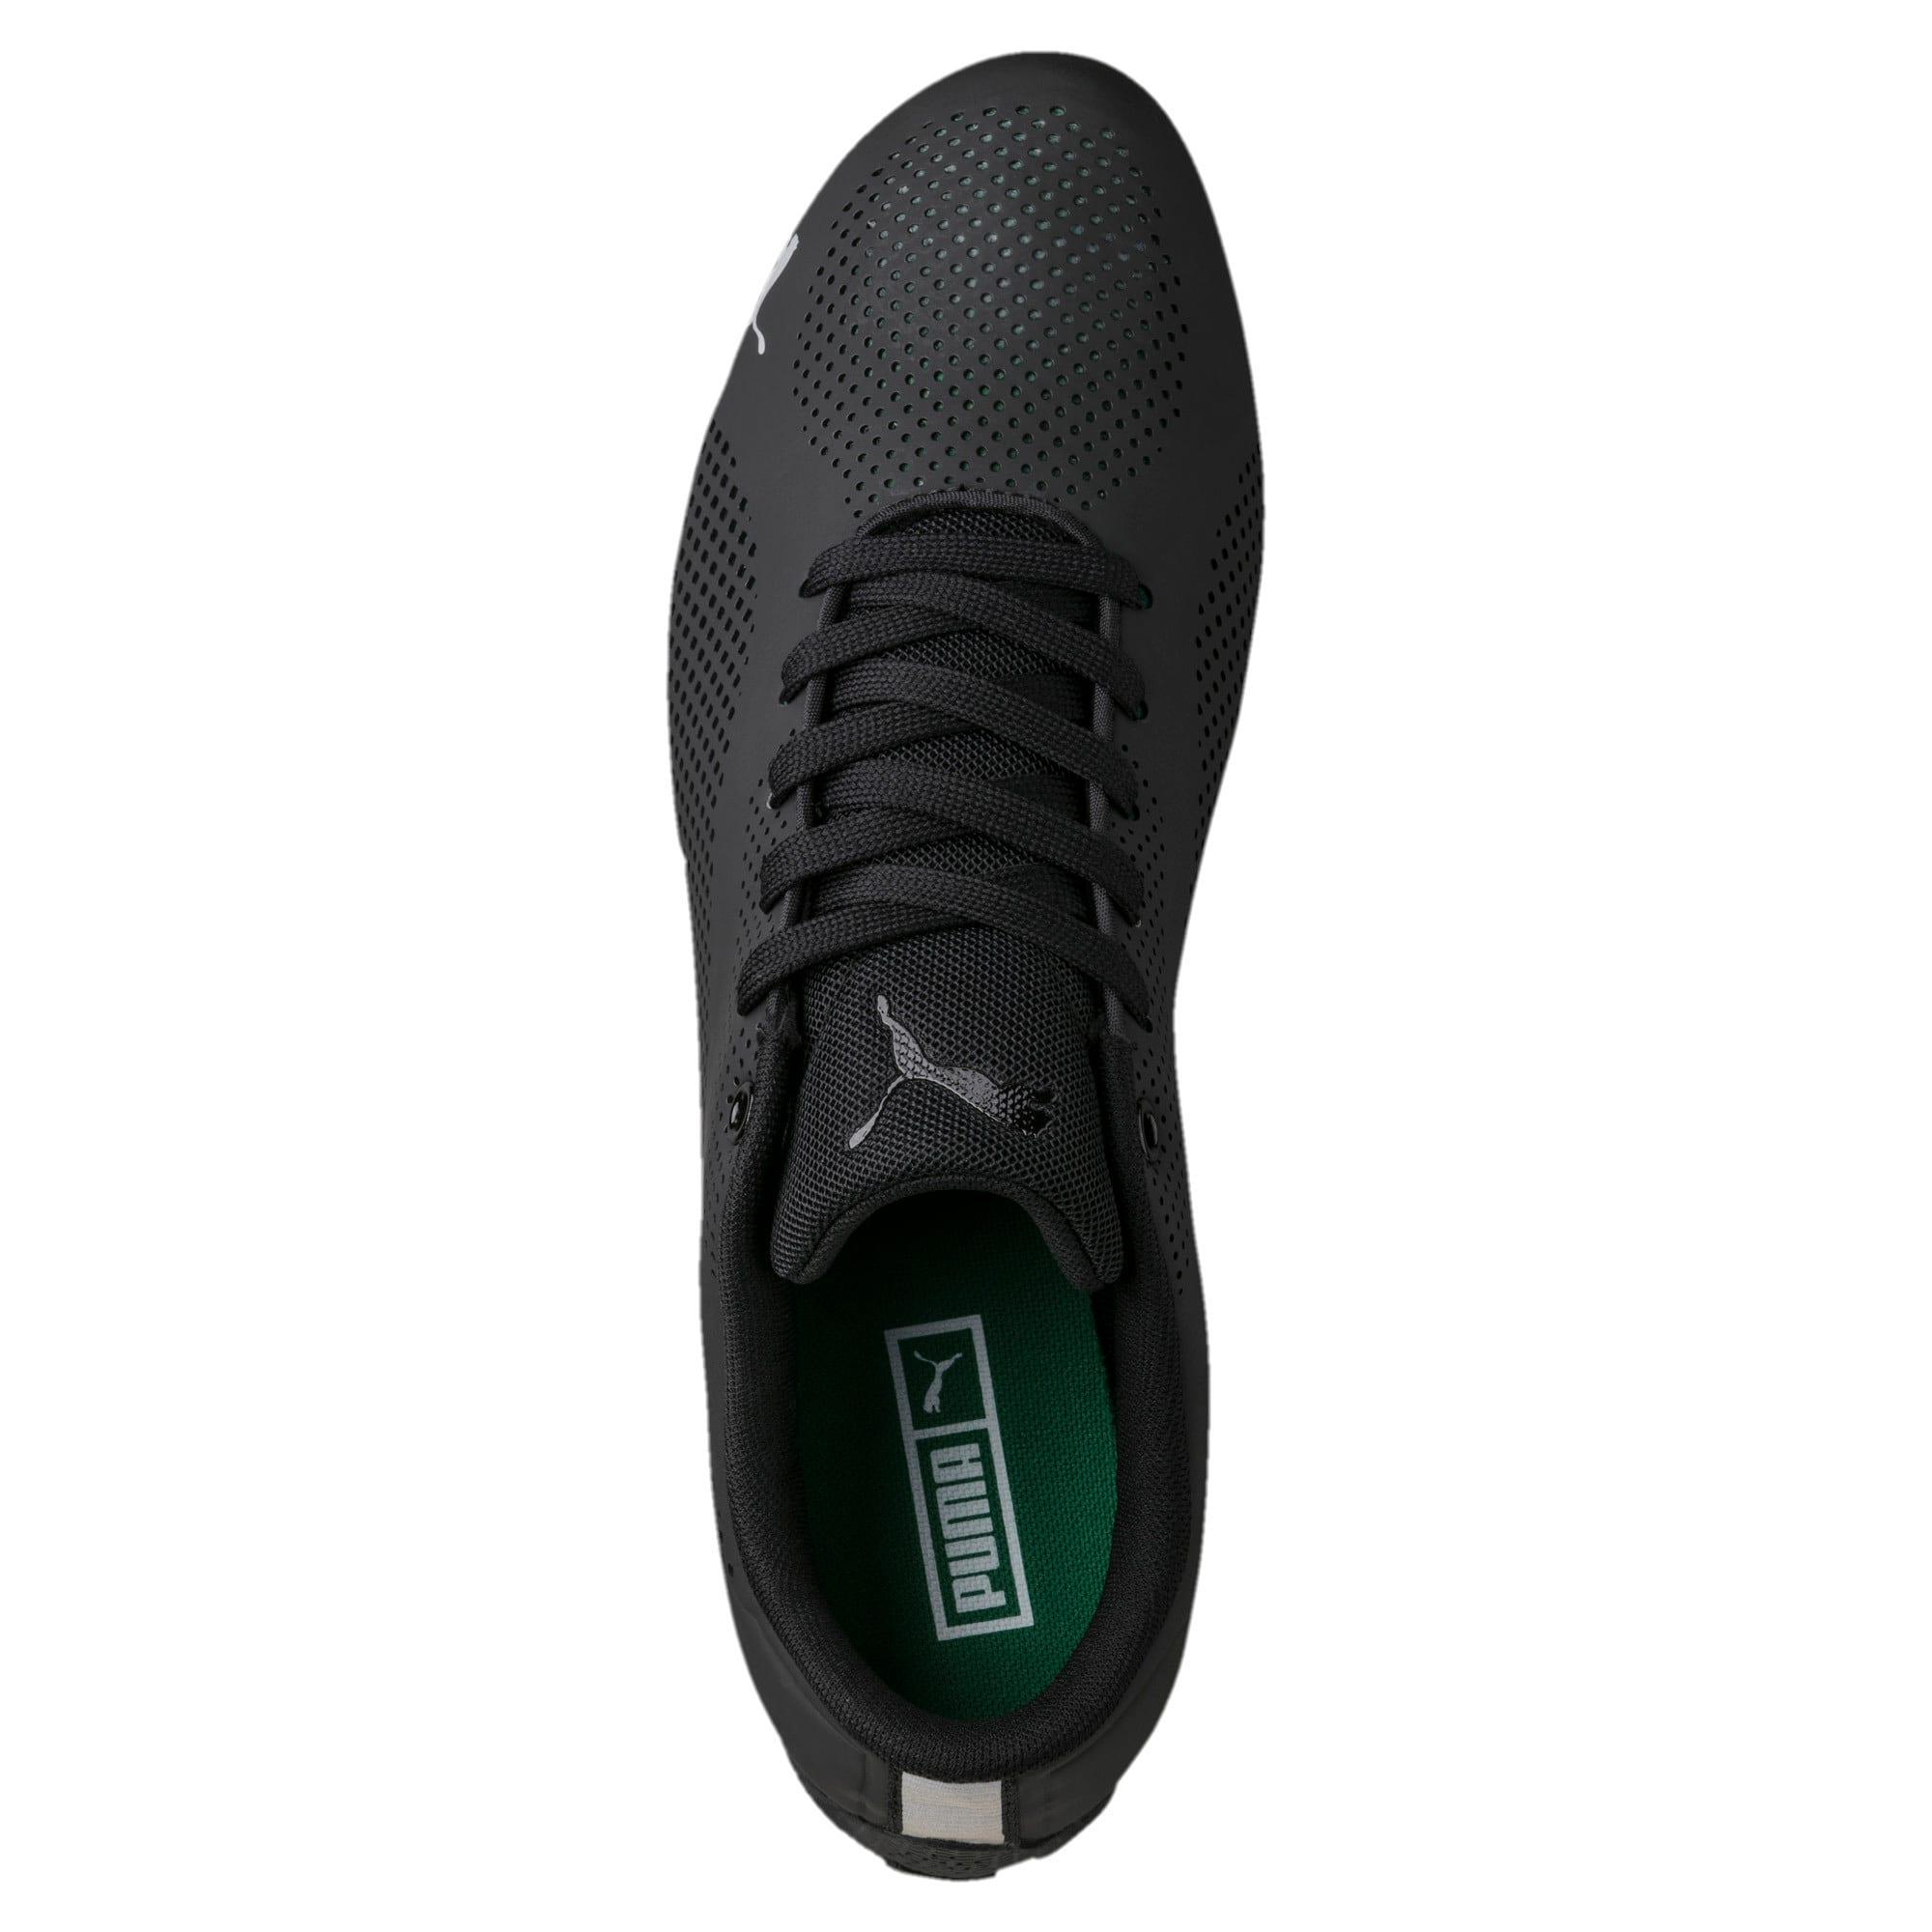 Thumbnail 5 of Drift Cat Ultra Reflective Shoes, Puma Black-Puma Black-Blk, medium